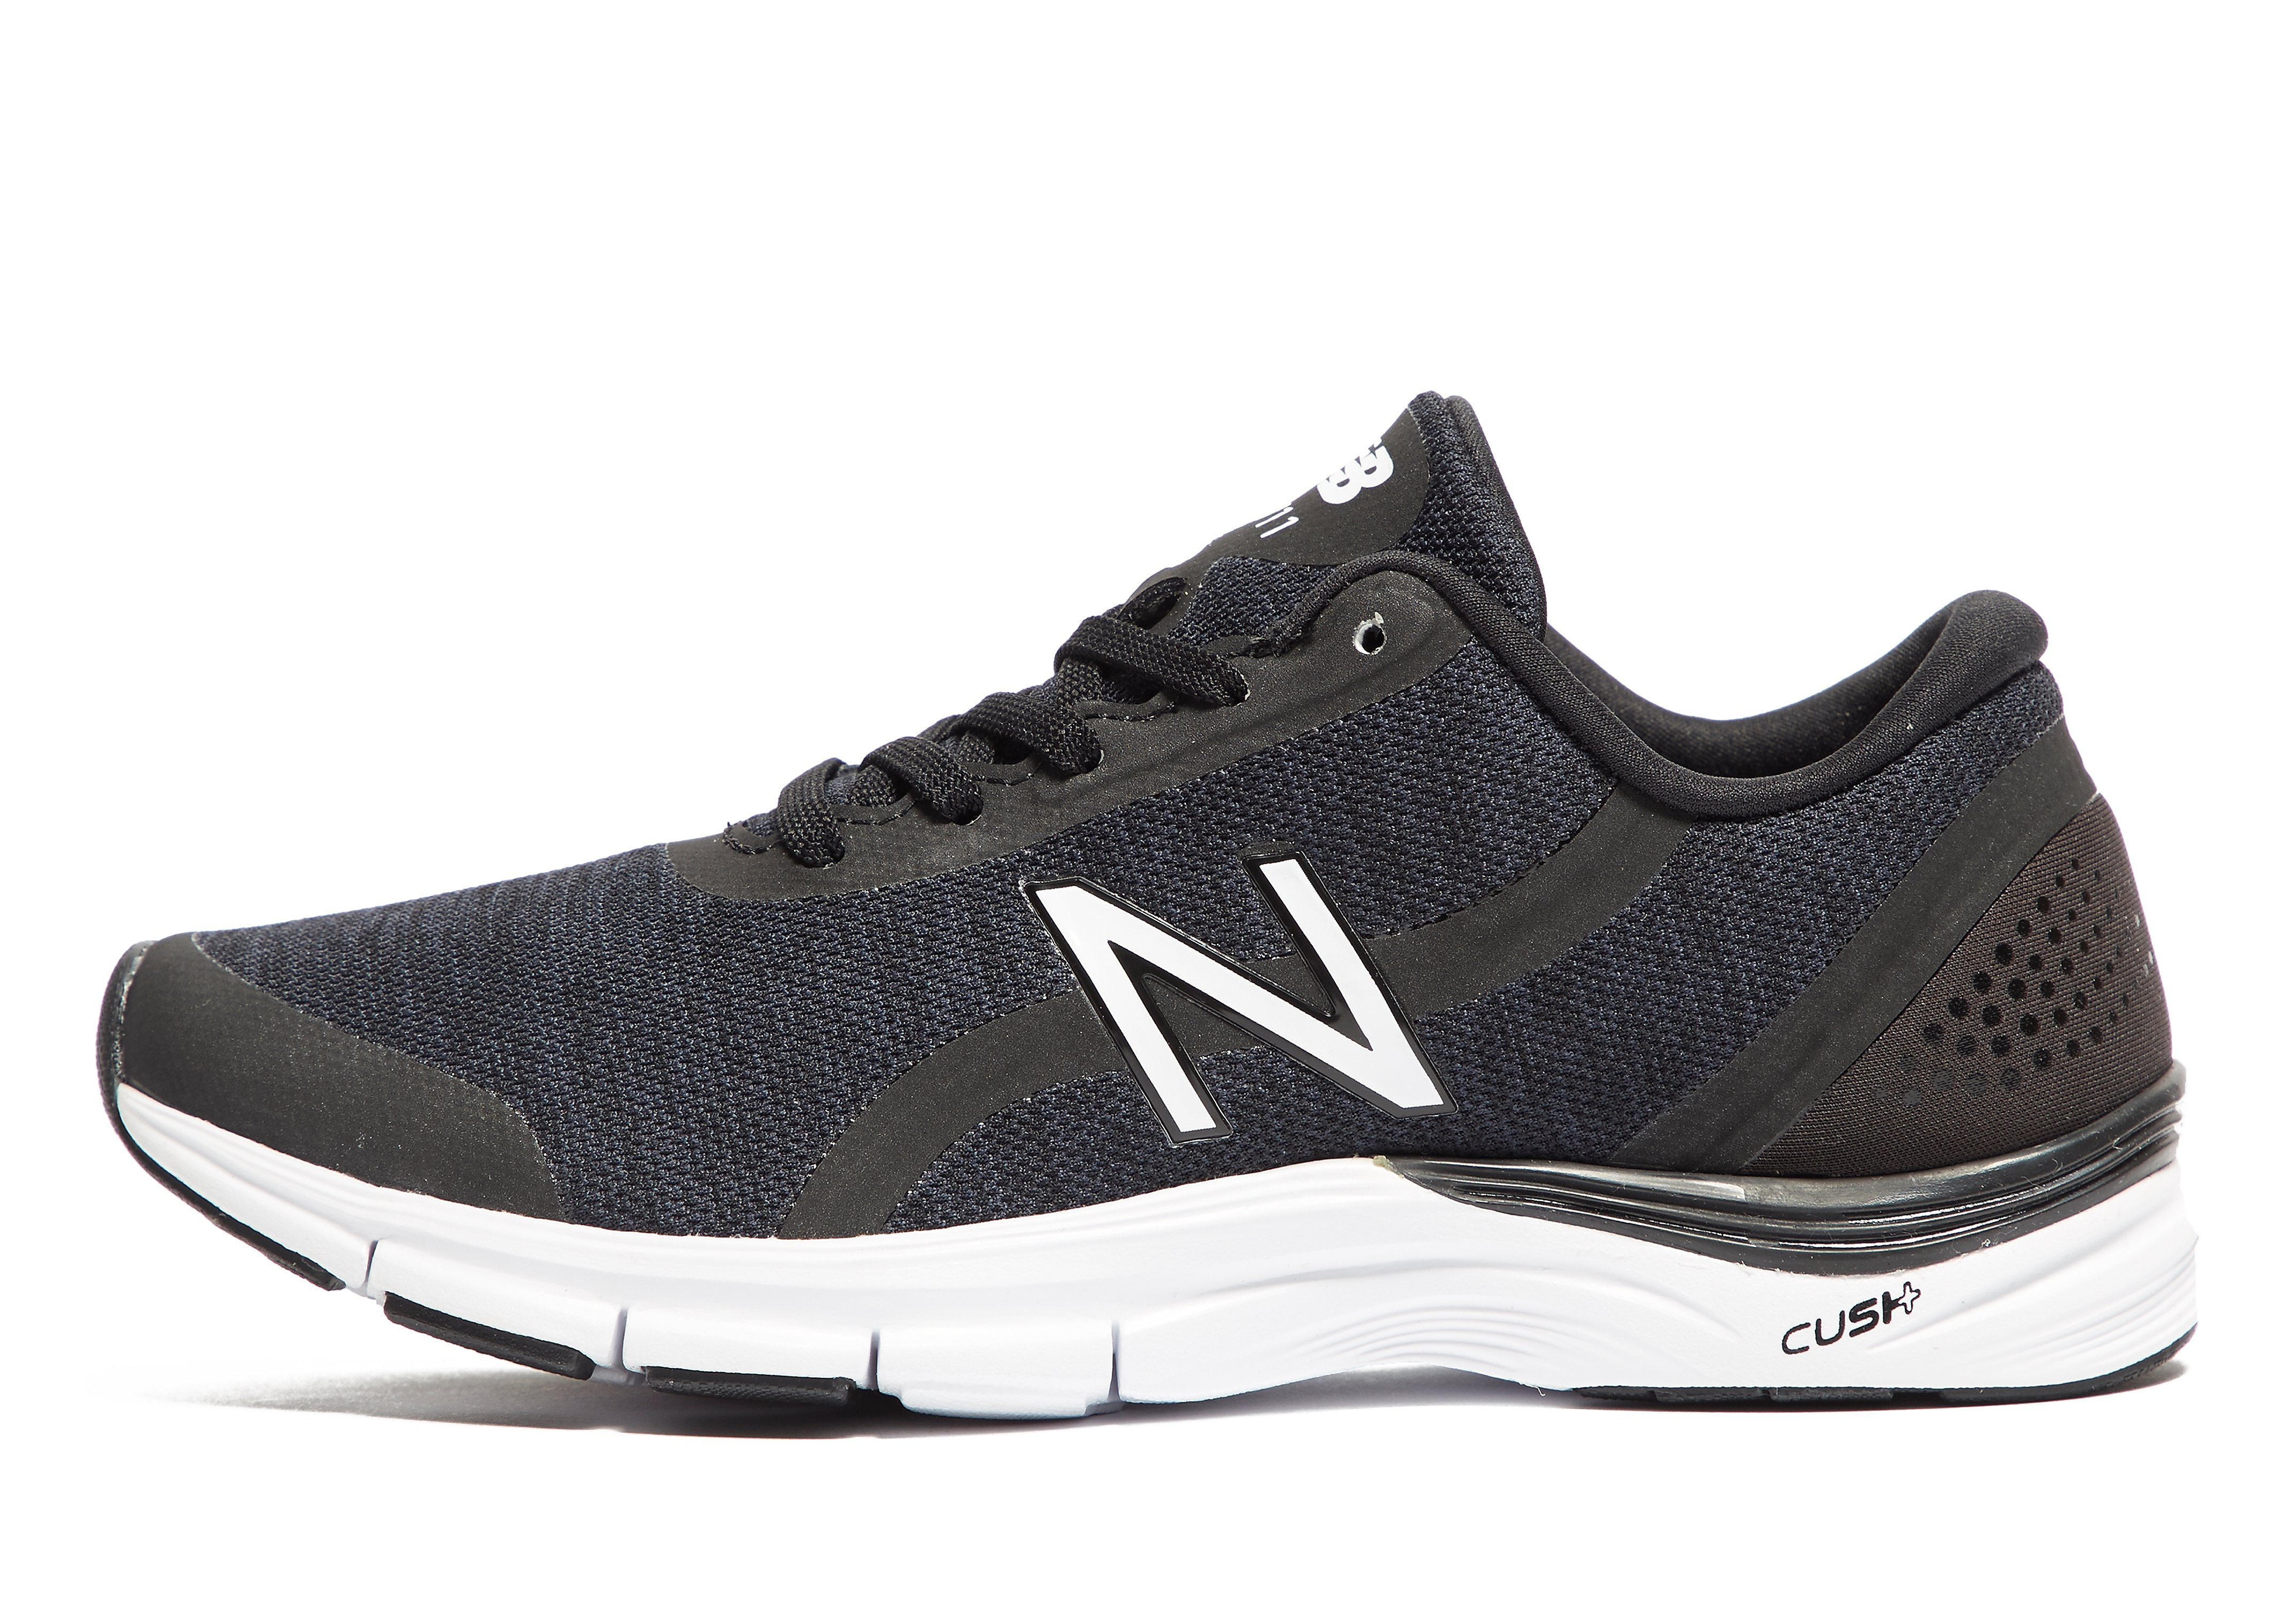 New Balance W711 V3 Training Shoes Women's